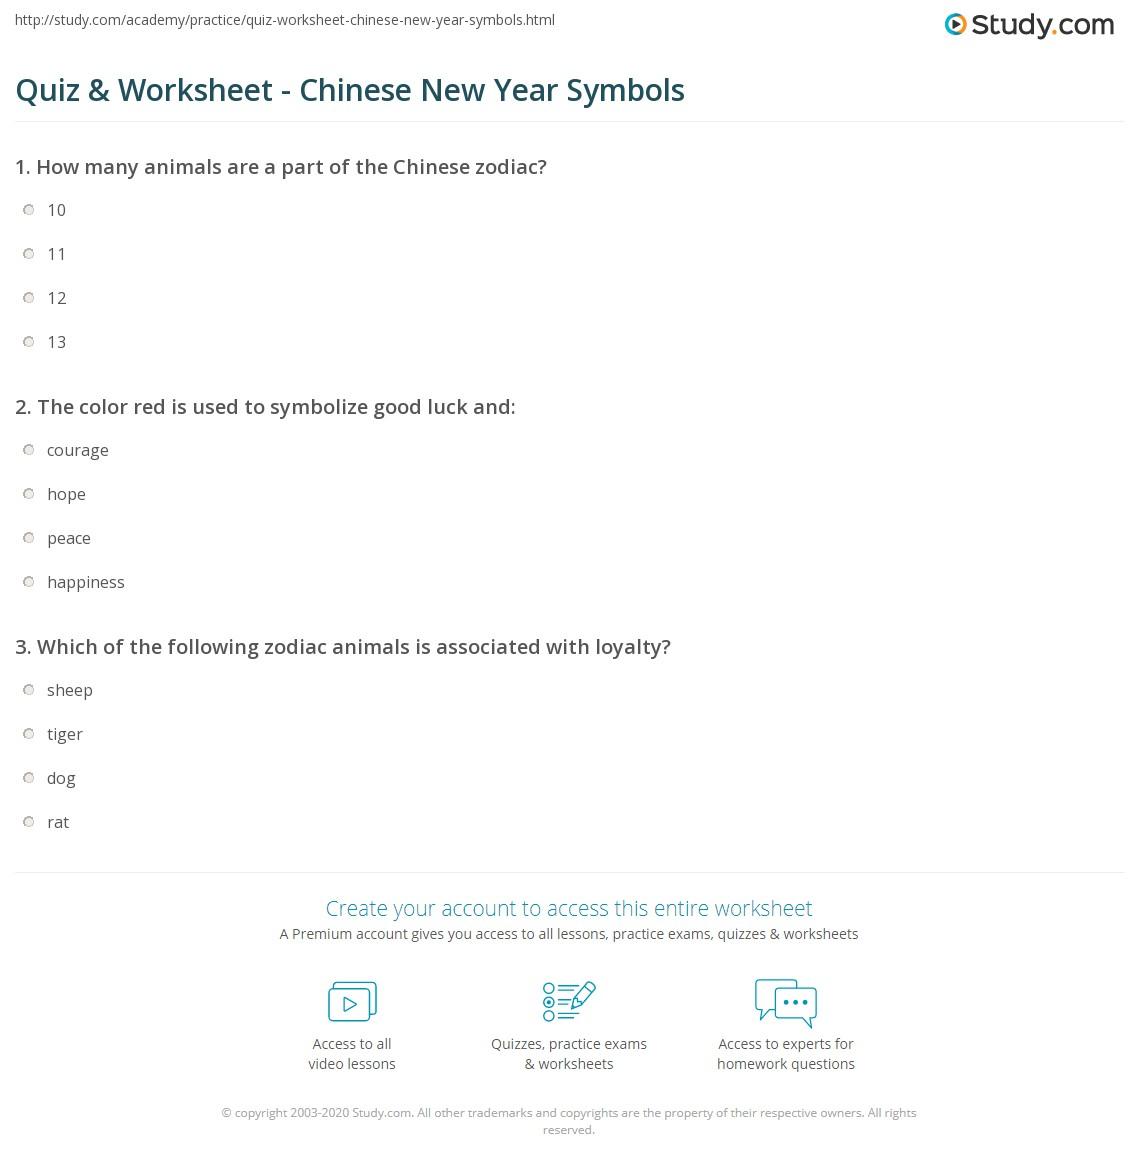 worksheet Signs And Symbols Worksheet quiz worksheet chinese new year symbols study com print signs worksheet